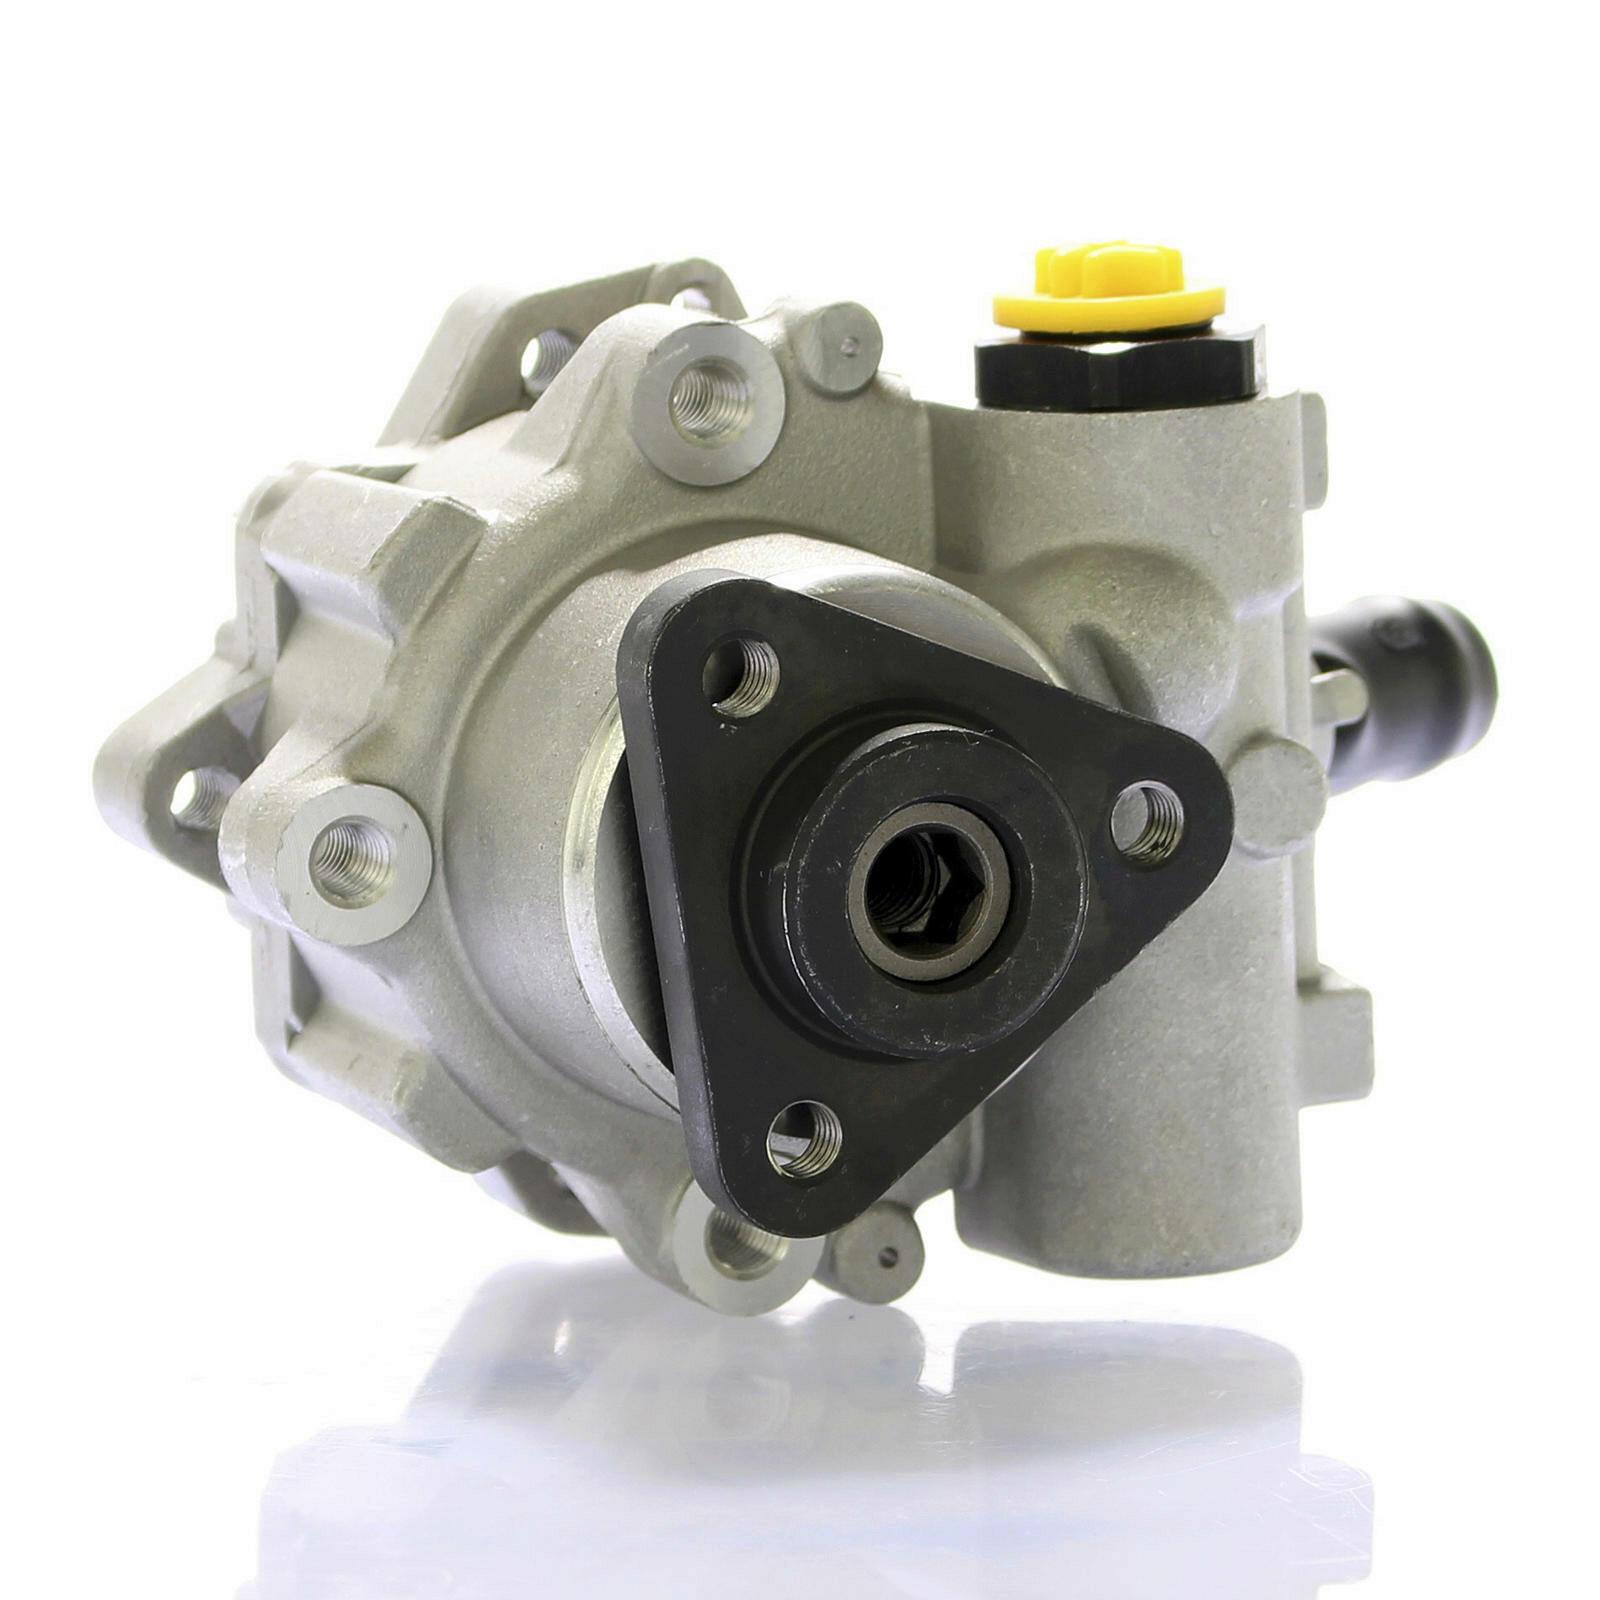 Servopumpe Hydraulikpumpe für AUDI A4 B6 / B7 // PFANDFREI // NEU